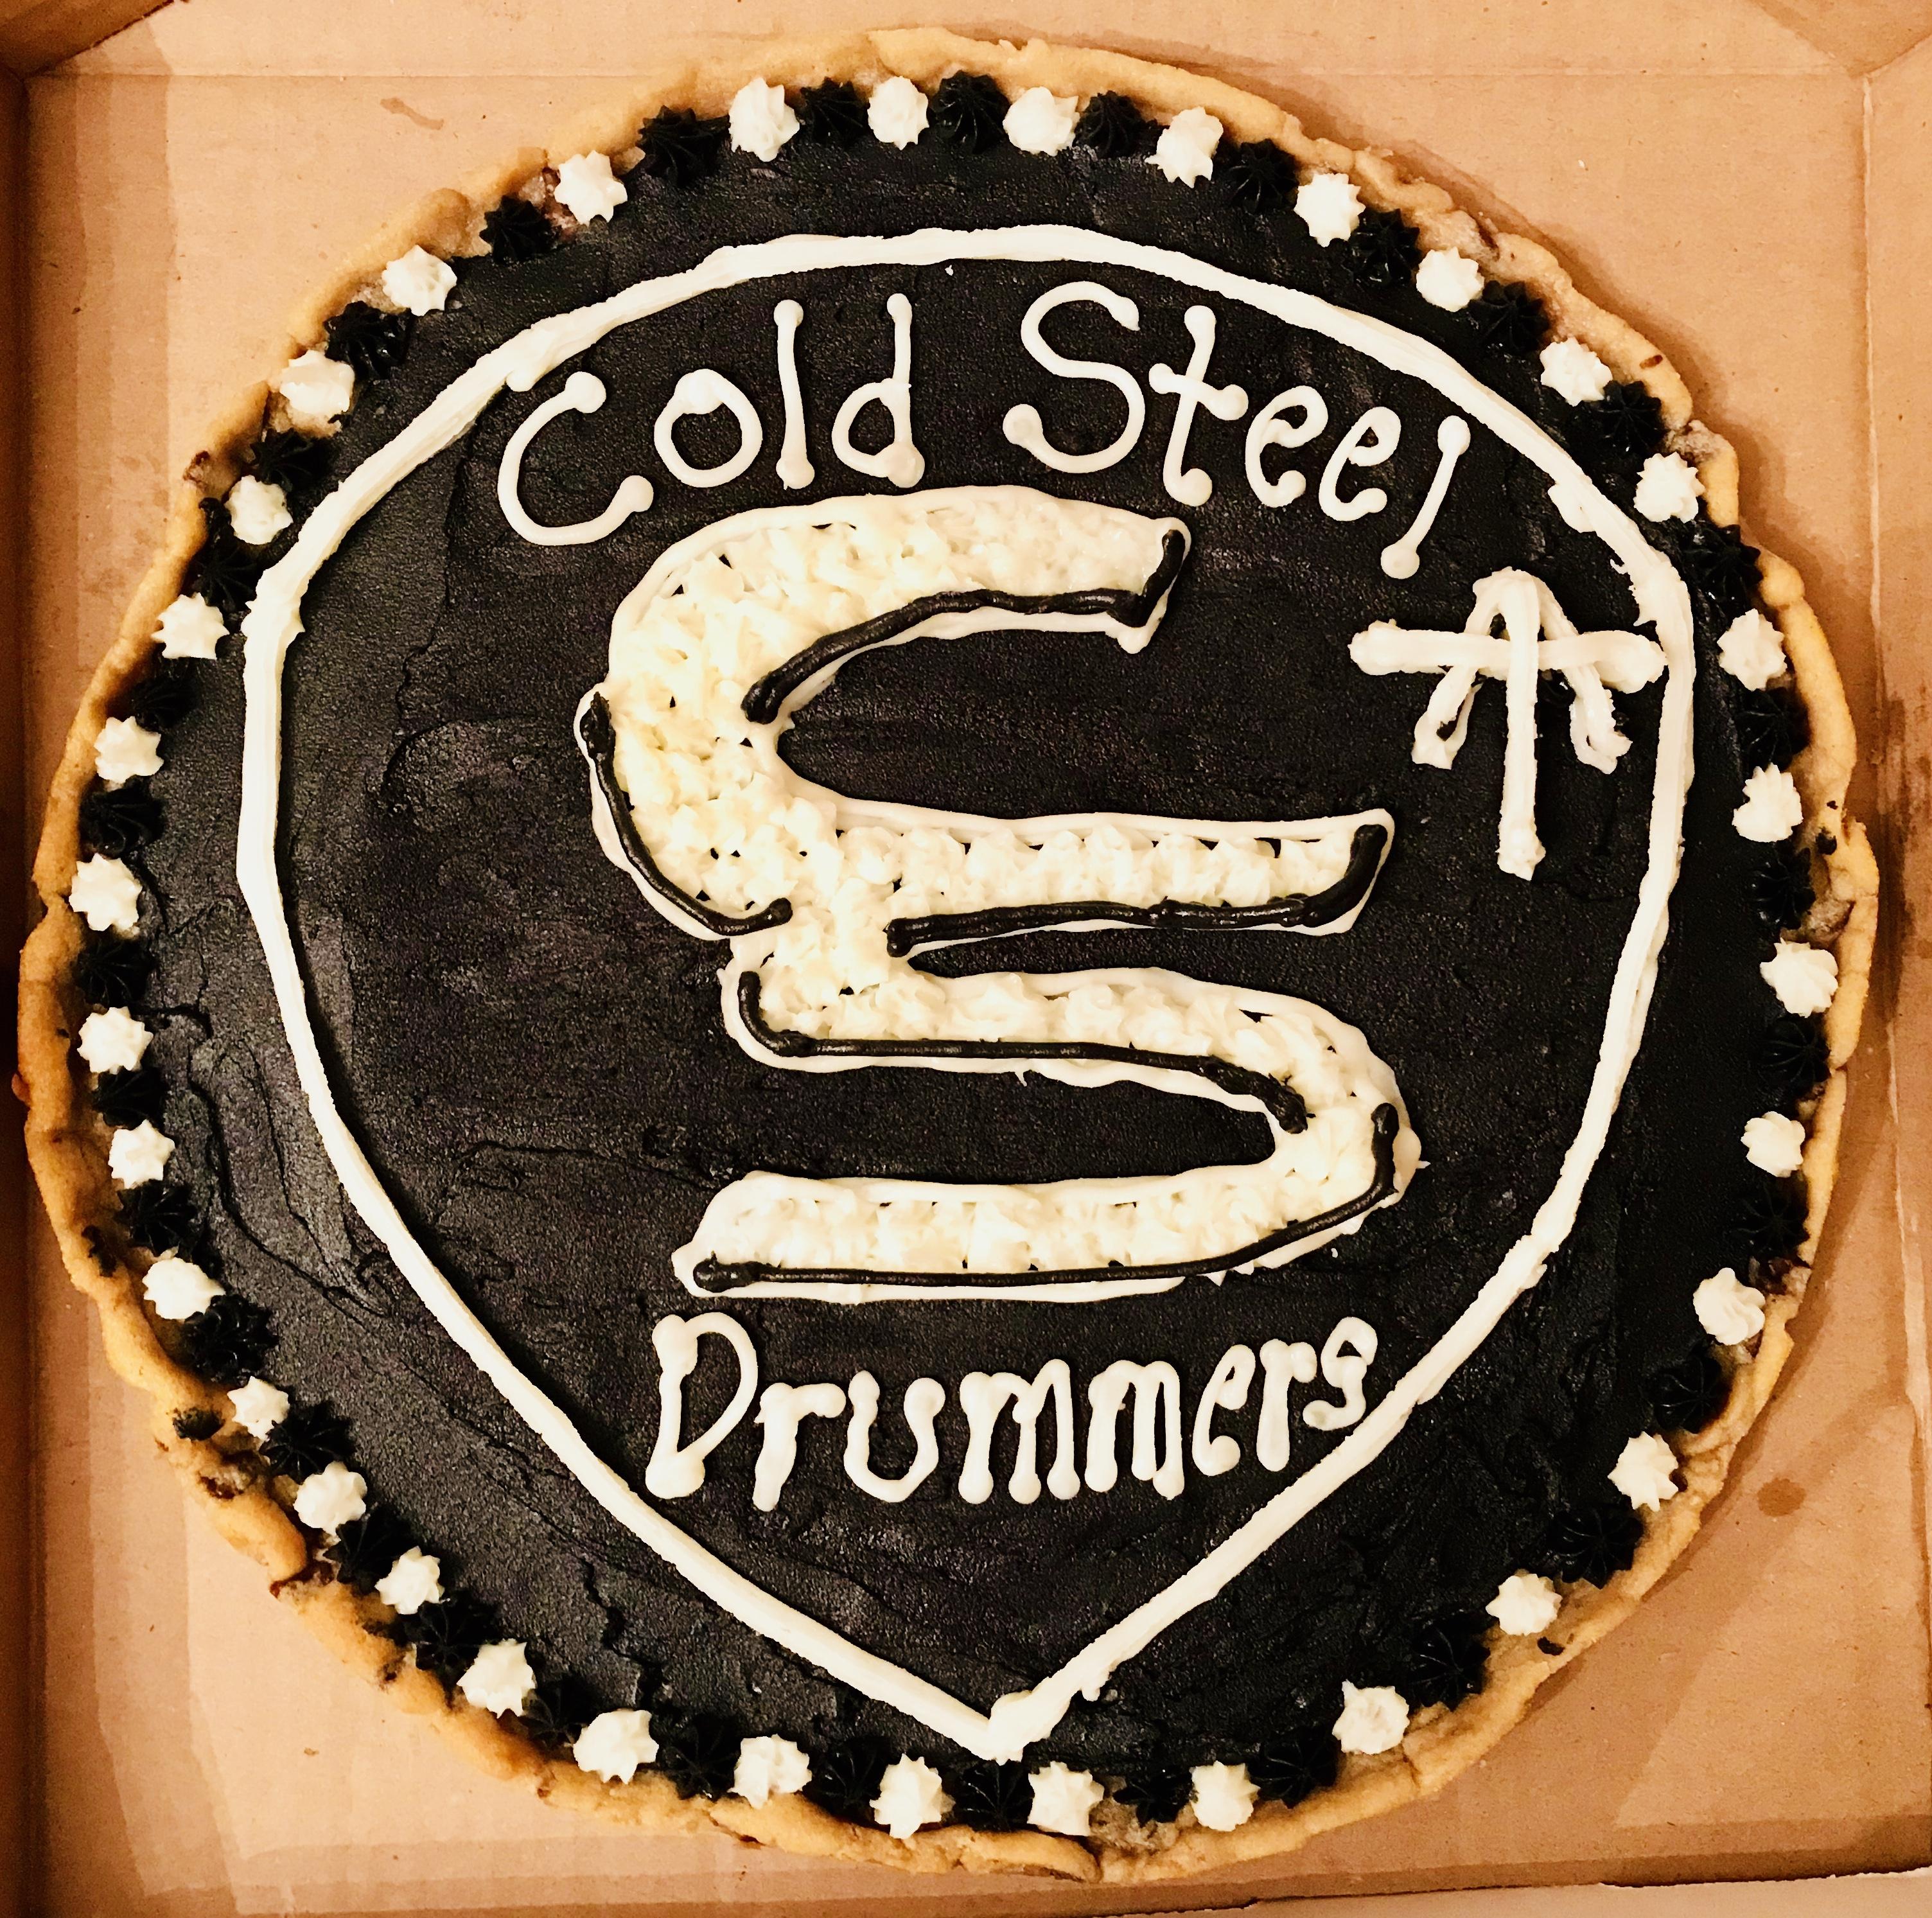 https://0201.nccdn.net/1_2/000/000/0b3/22b/cold-steel-drummers-3008x2986.jpg